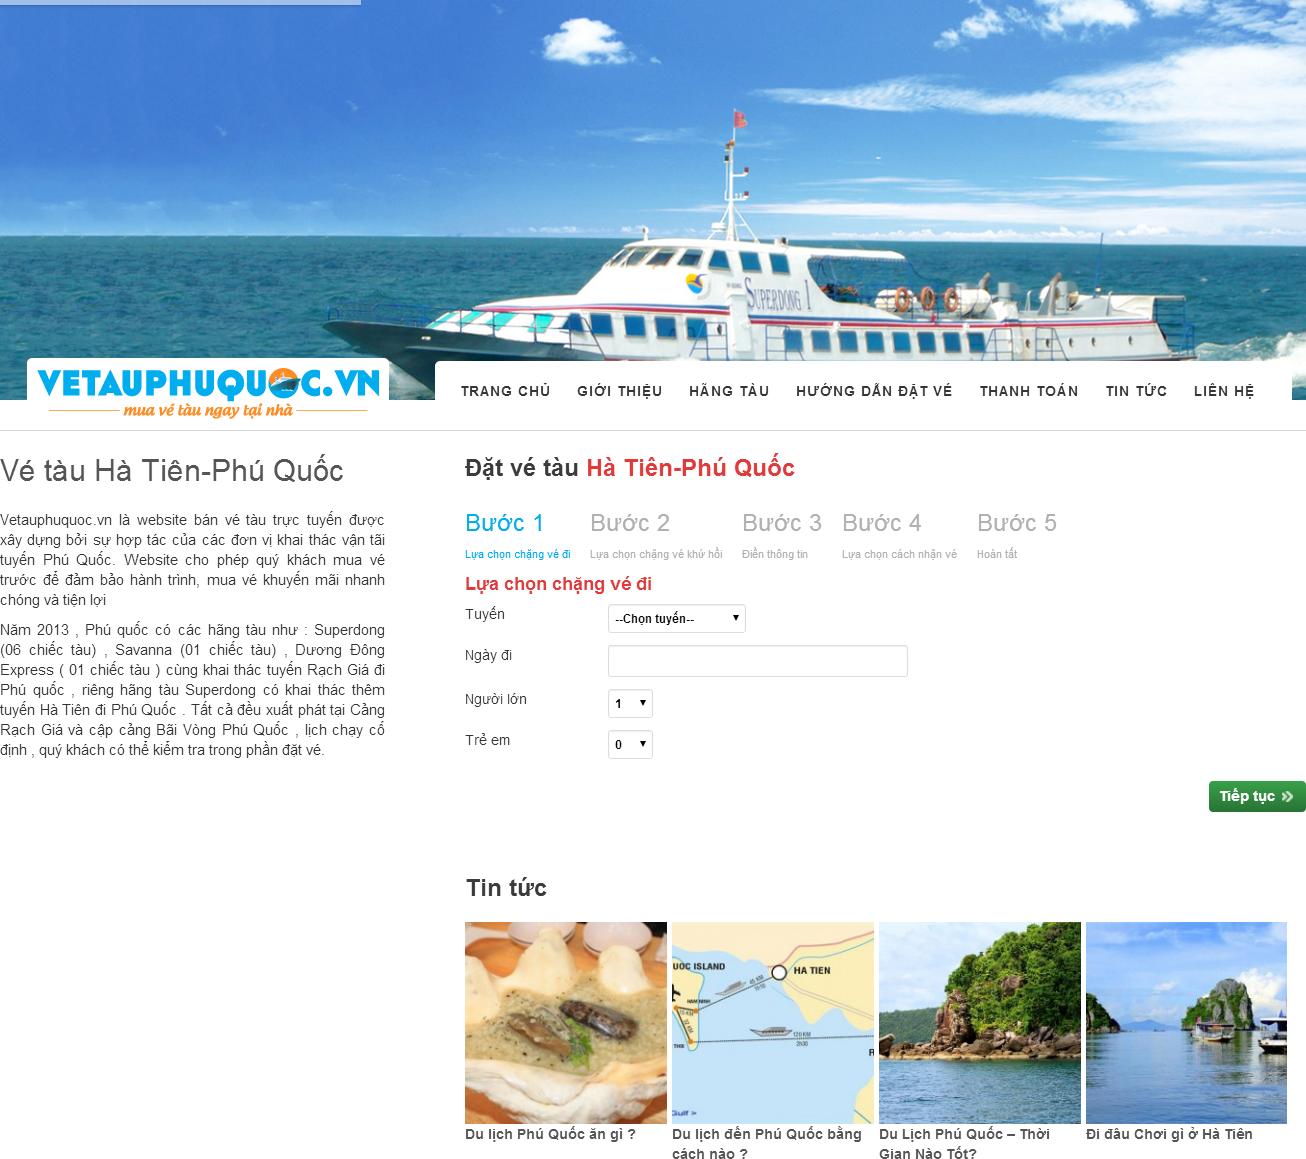 Hướng dẫn quản trị website hatienphuquoc.com.vn